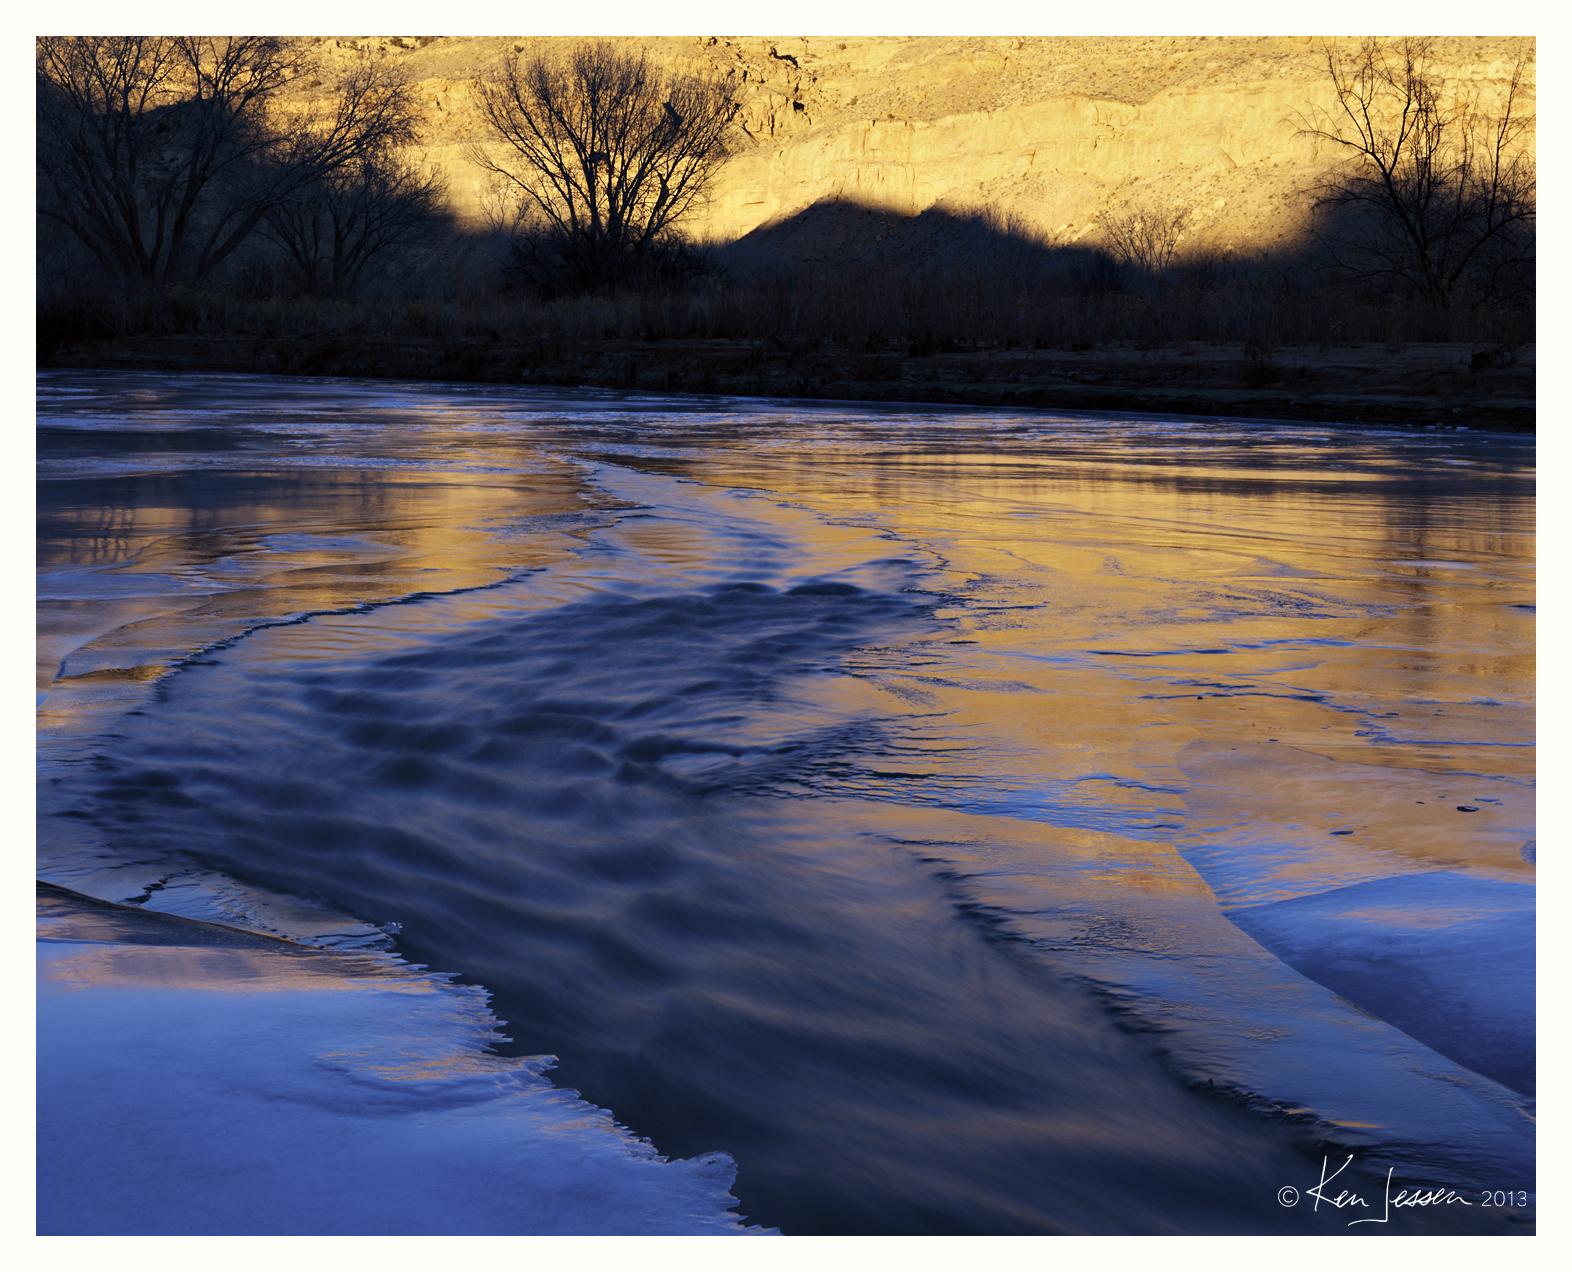 Frozen River, Gold Light